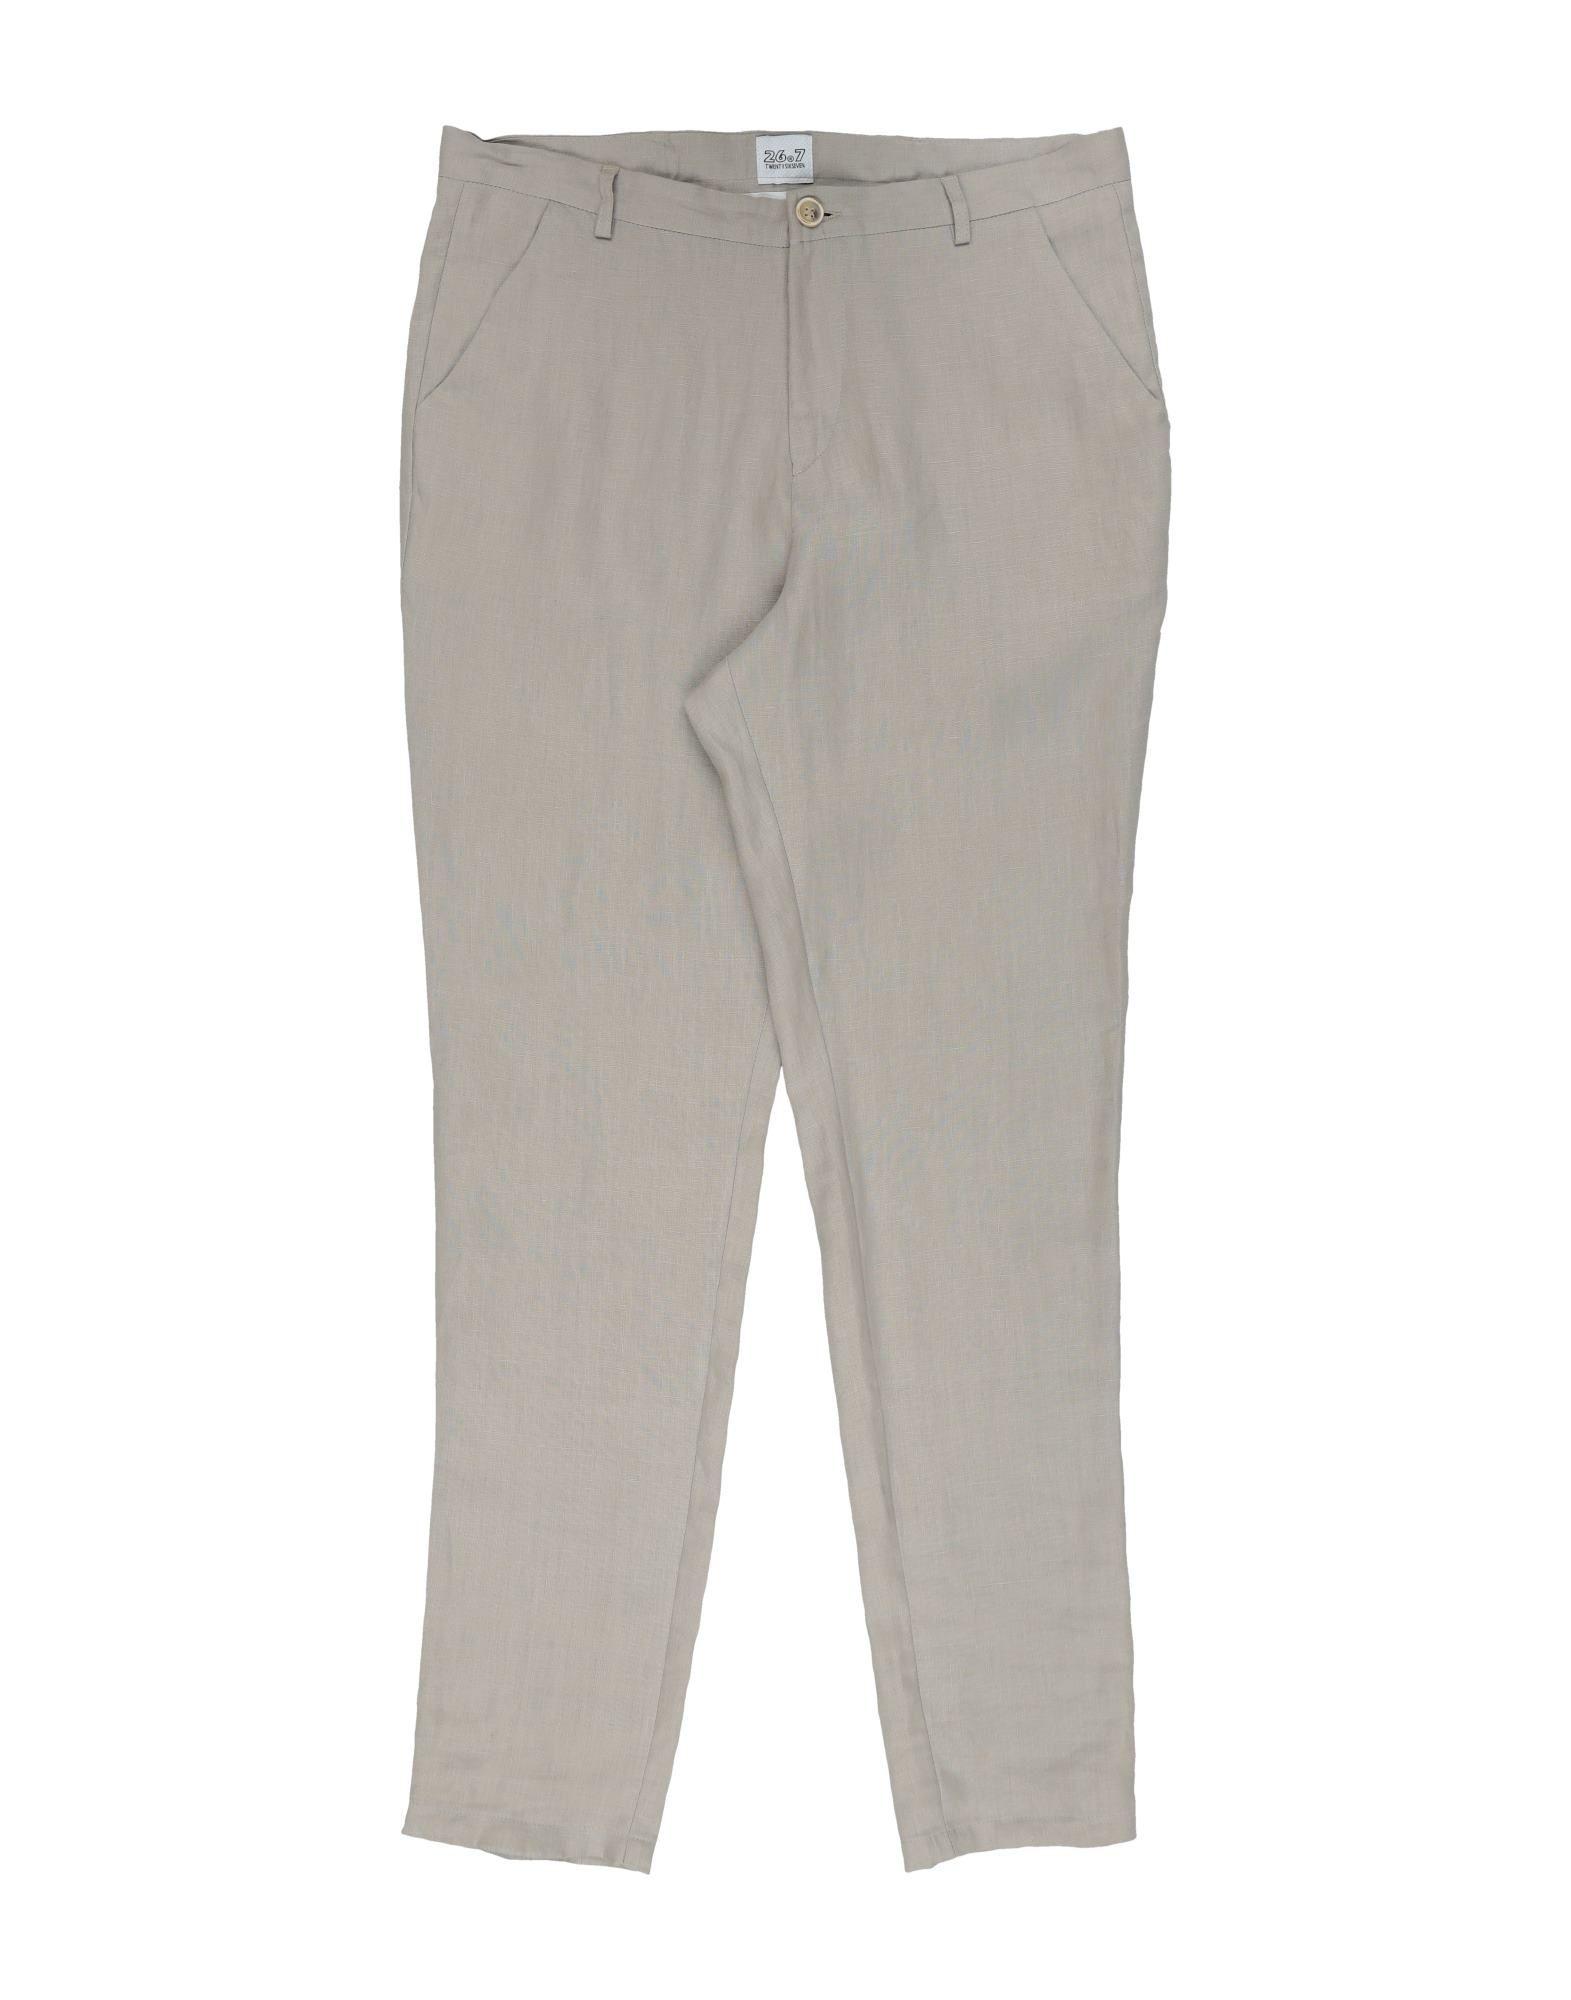 26.7 Twentysixseven Kids' Casual Pants In Light Grey